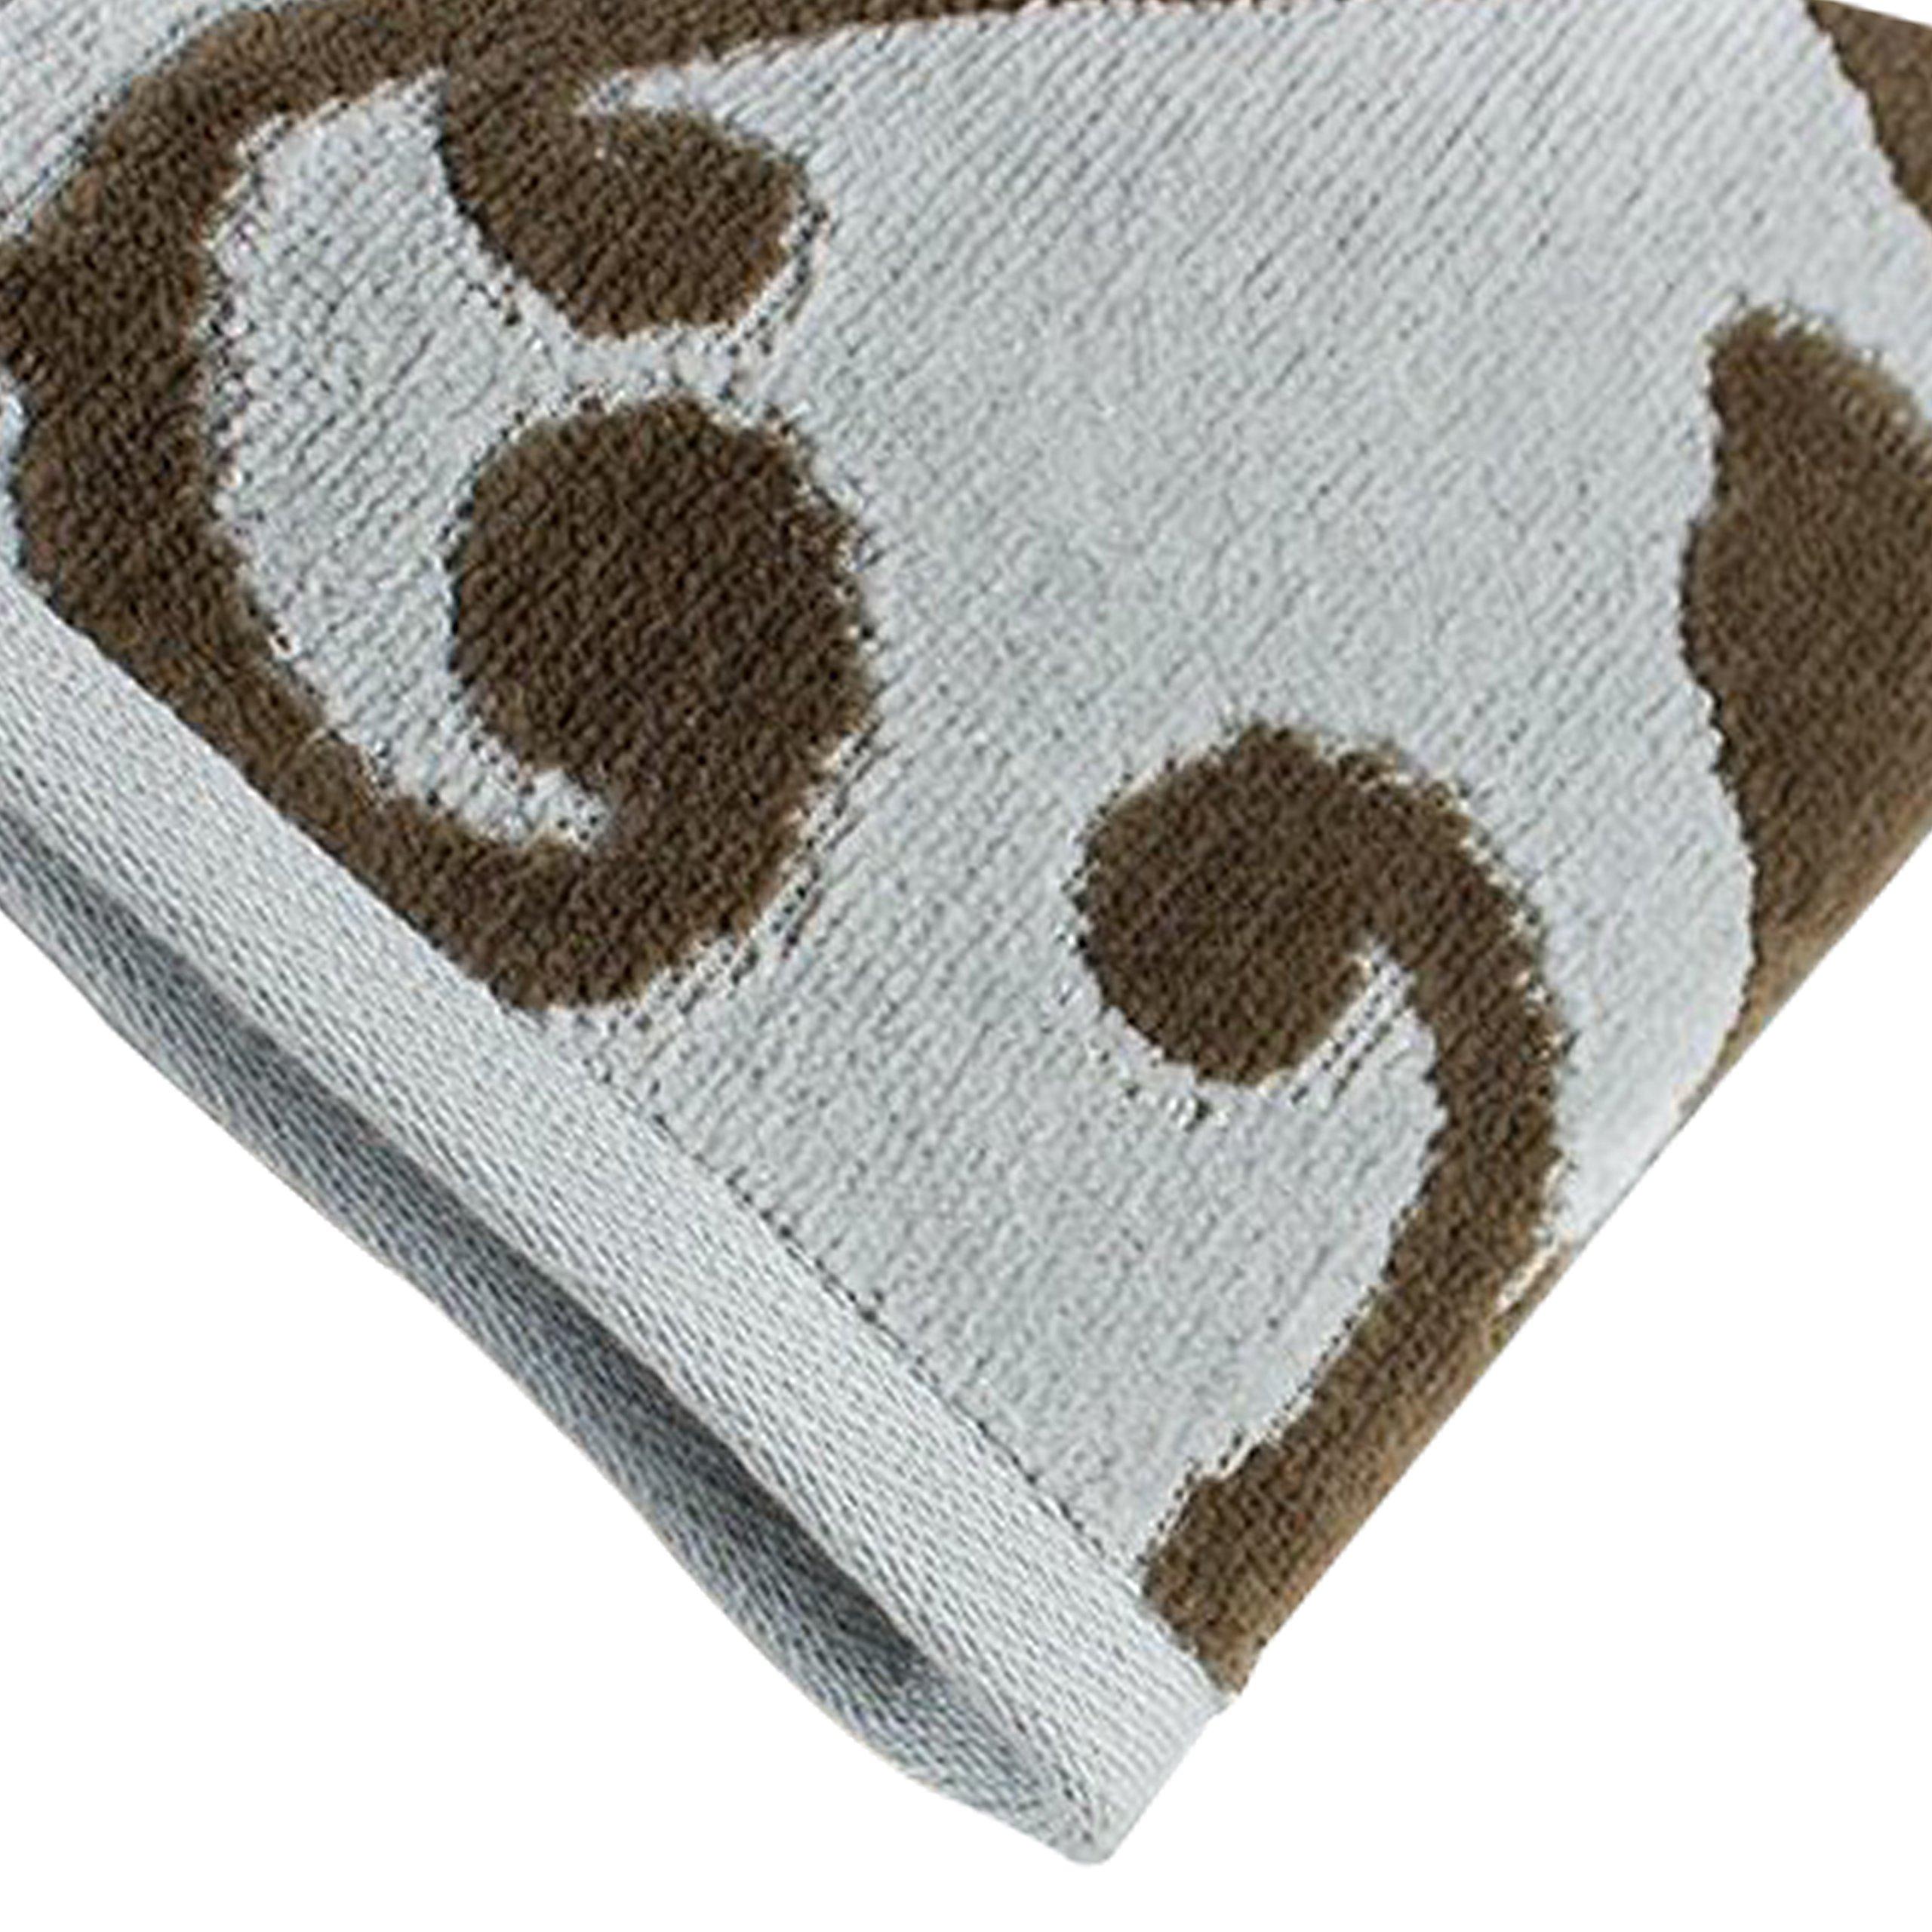 Luxor Linens - 100% Cotton 5 PC Absorbent Jacquard Towel Set, Hotel Luxury- 2 Bath Towels, 2 Hand Towels, 1 Wash Cloth Provance Collection (1 Bath Towel)